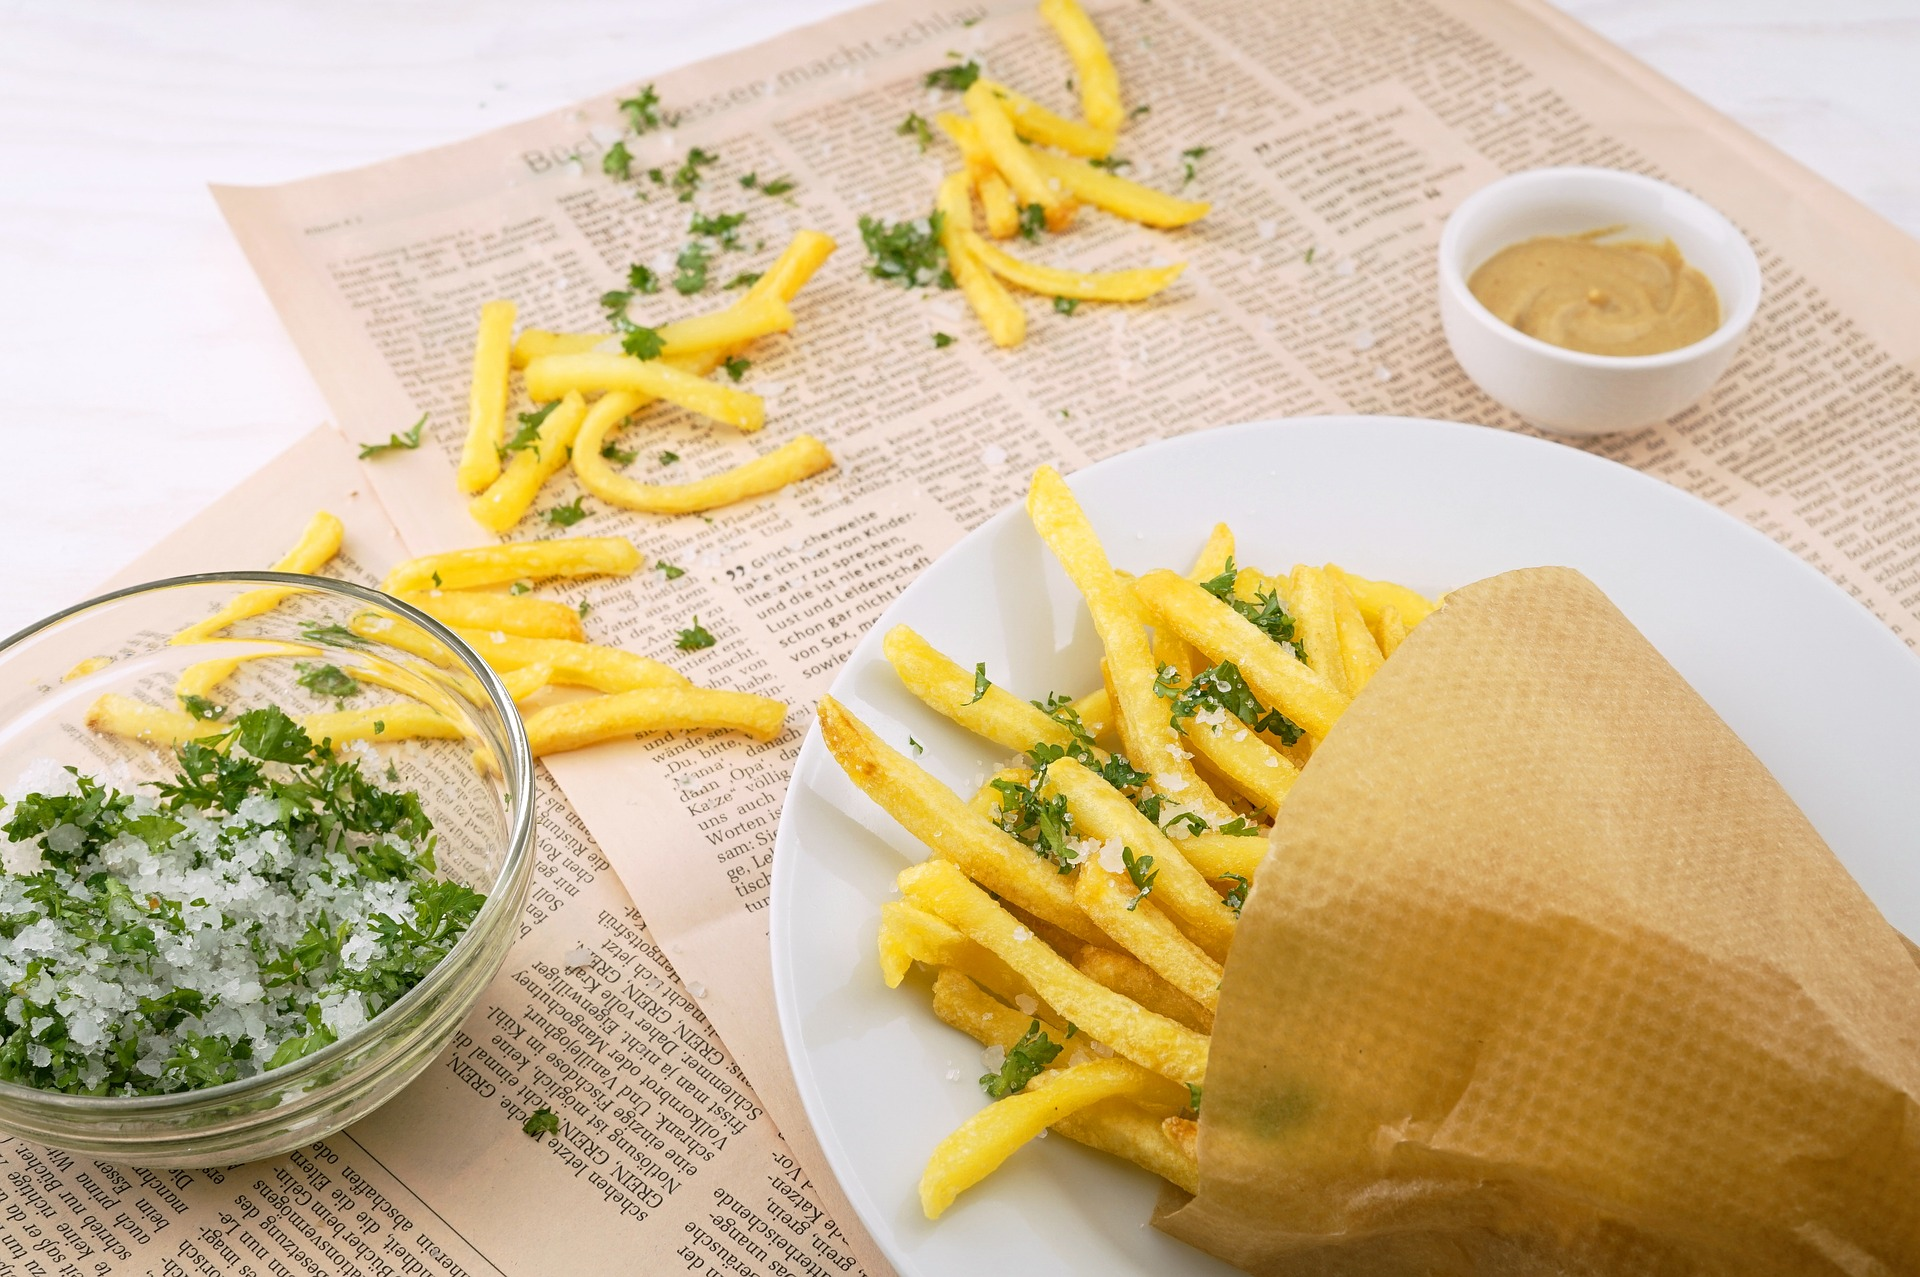 Makanan cepat saji (Ilustrasi: Pixabay)